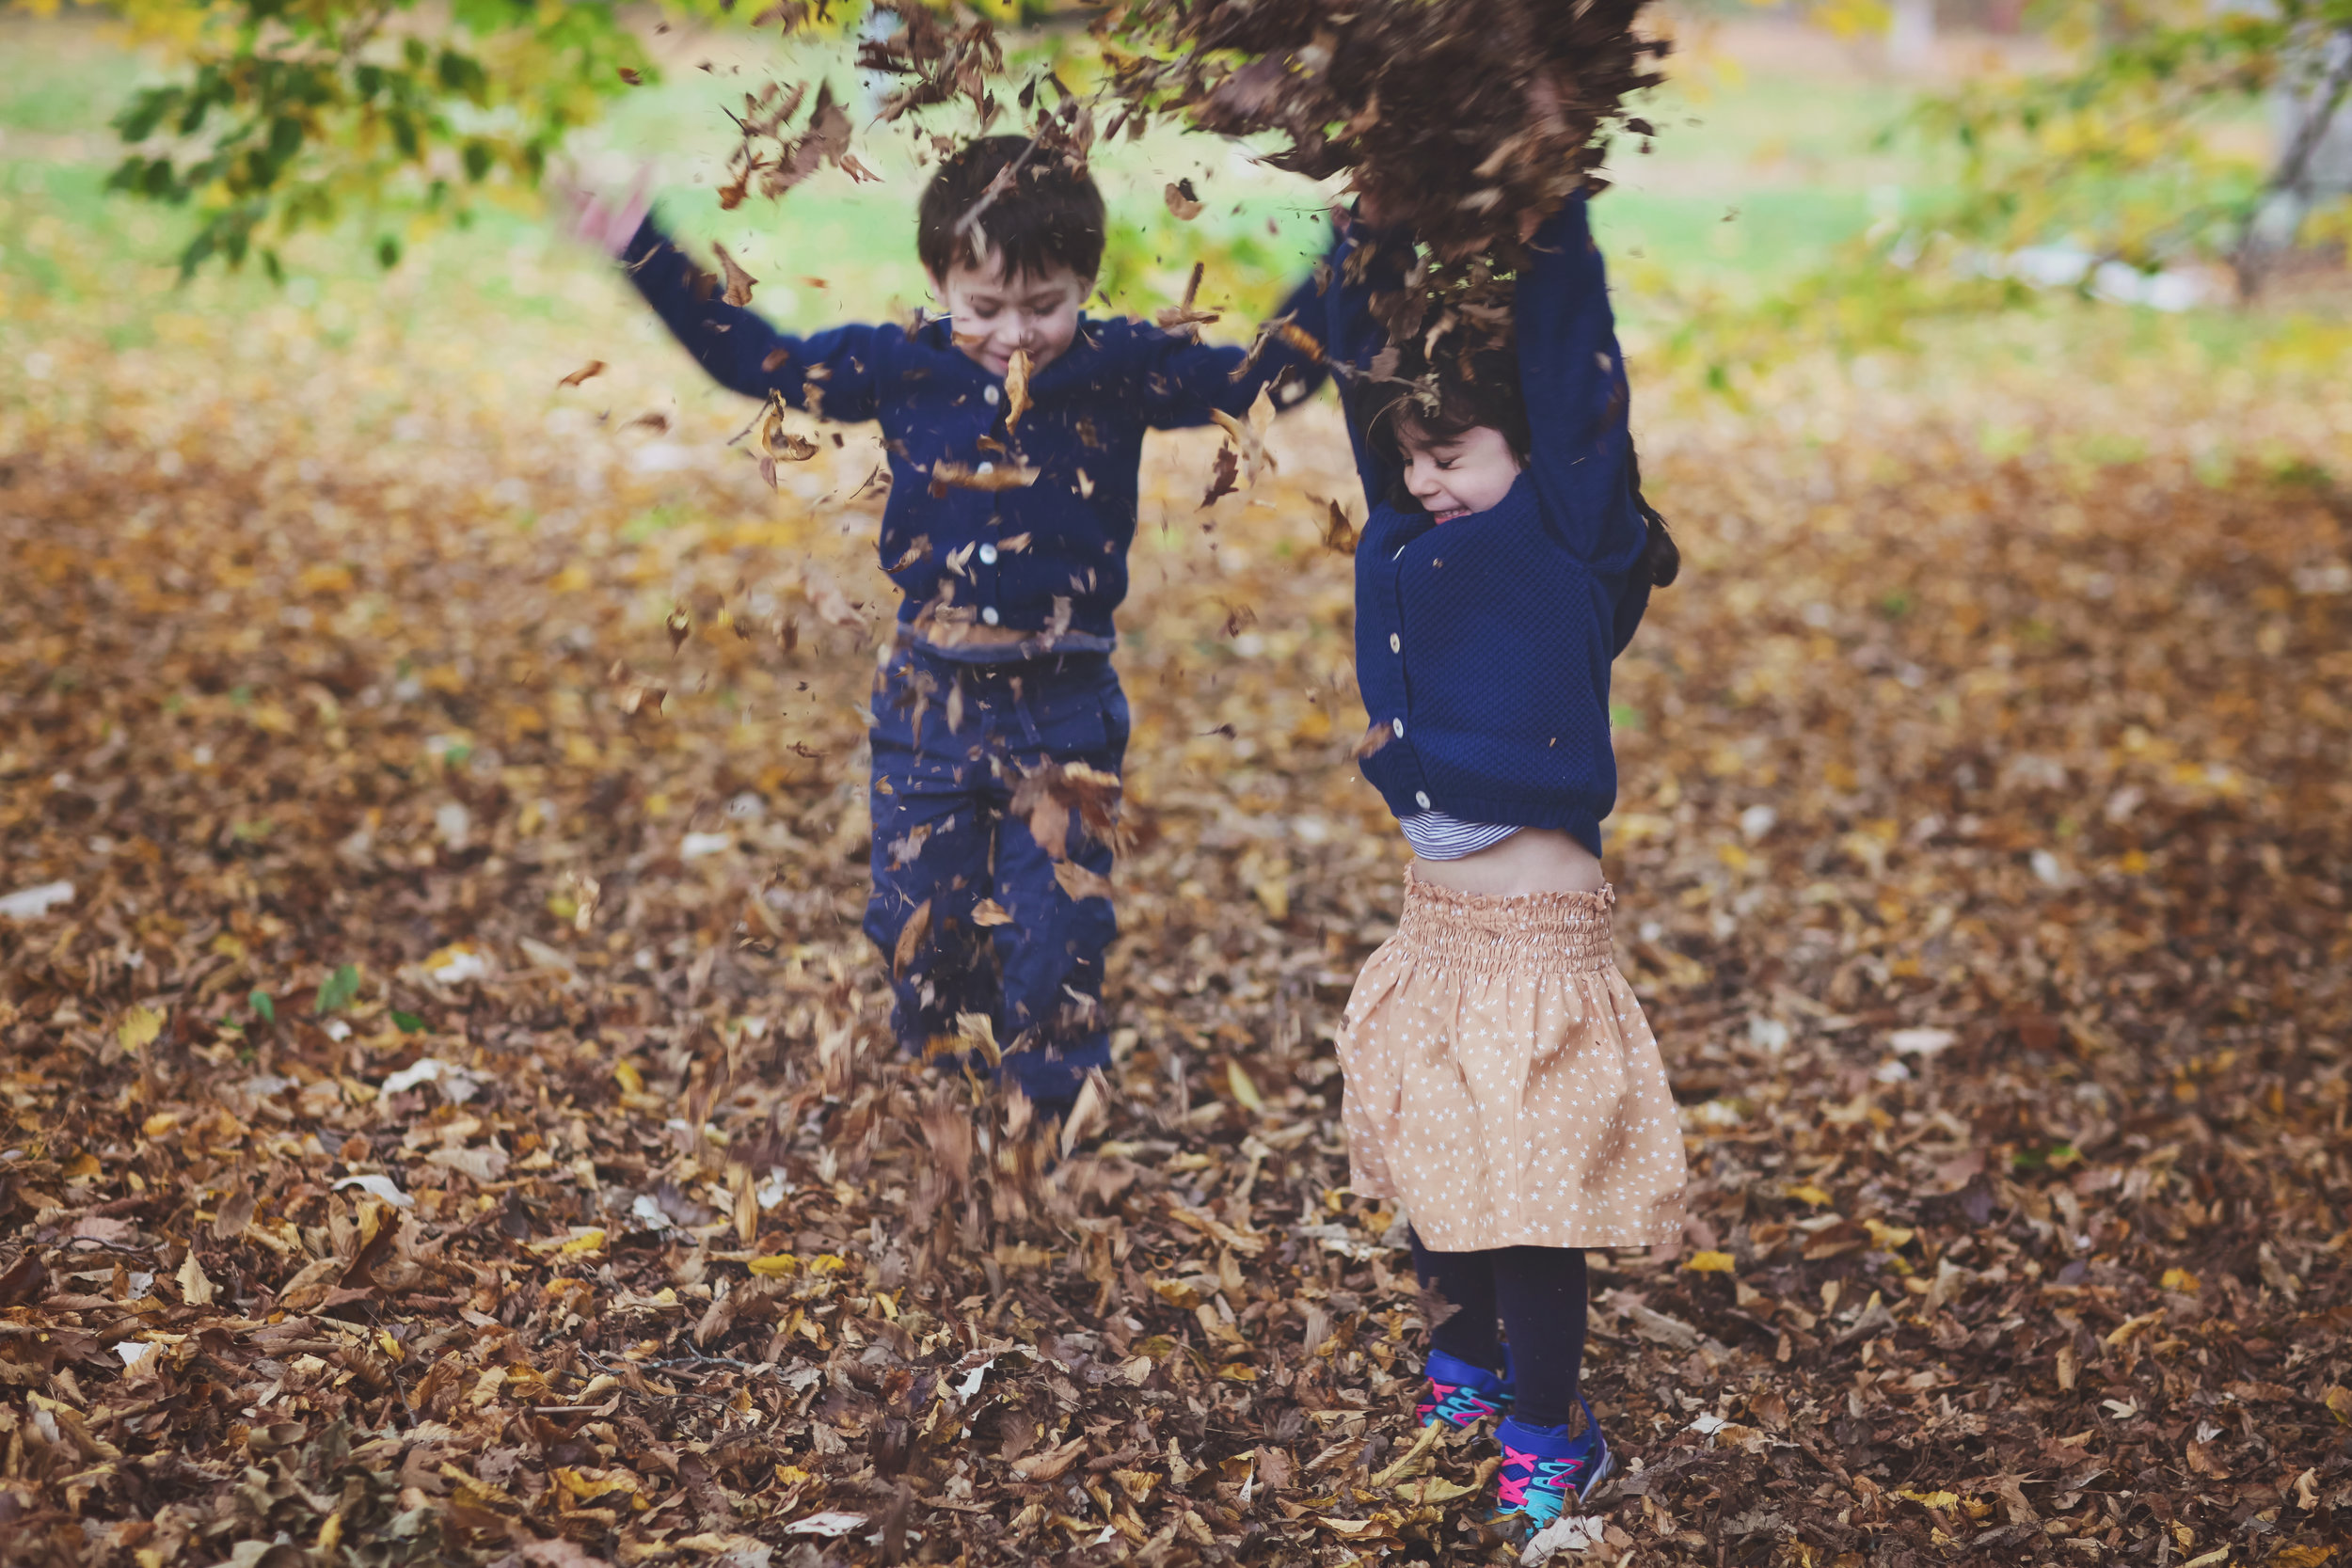 carson-skylar-fall-2015.jpg